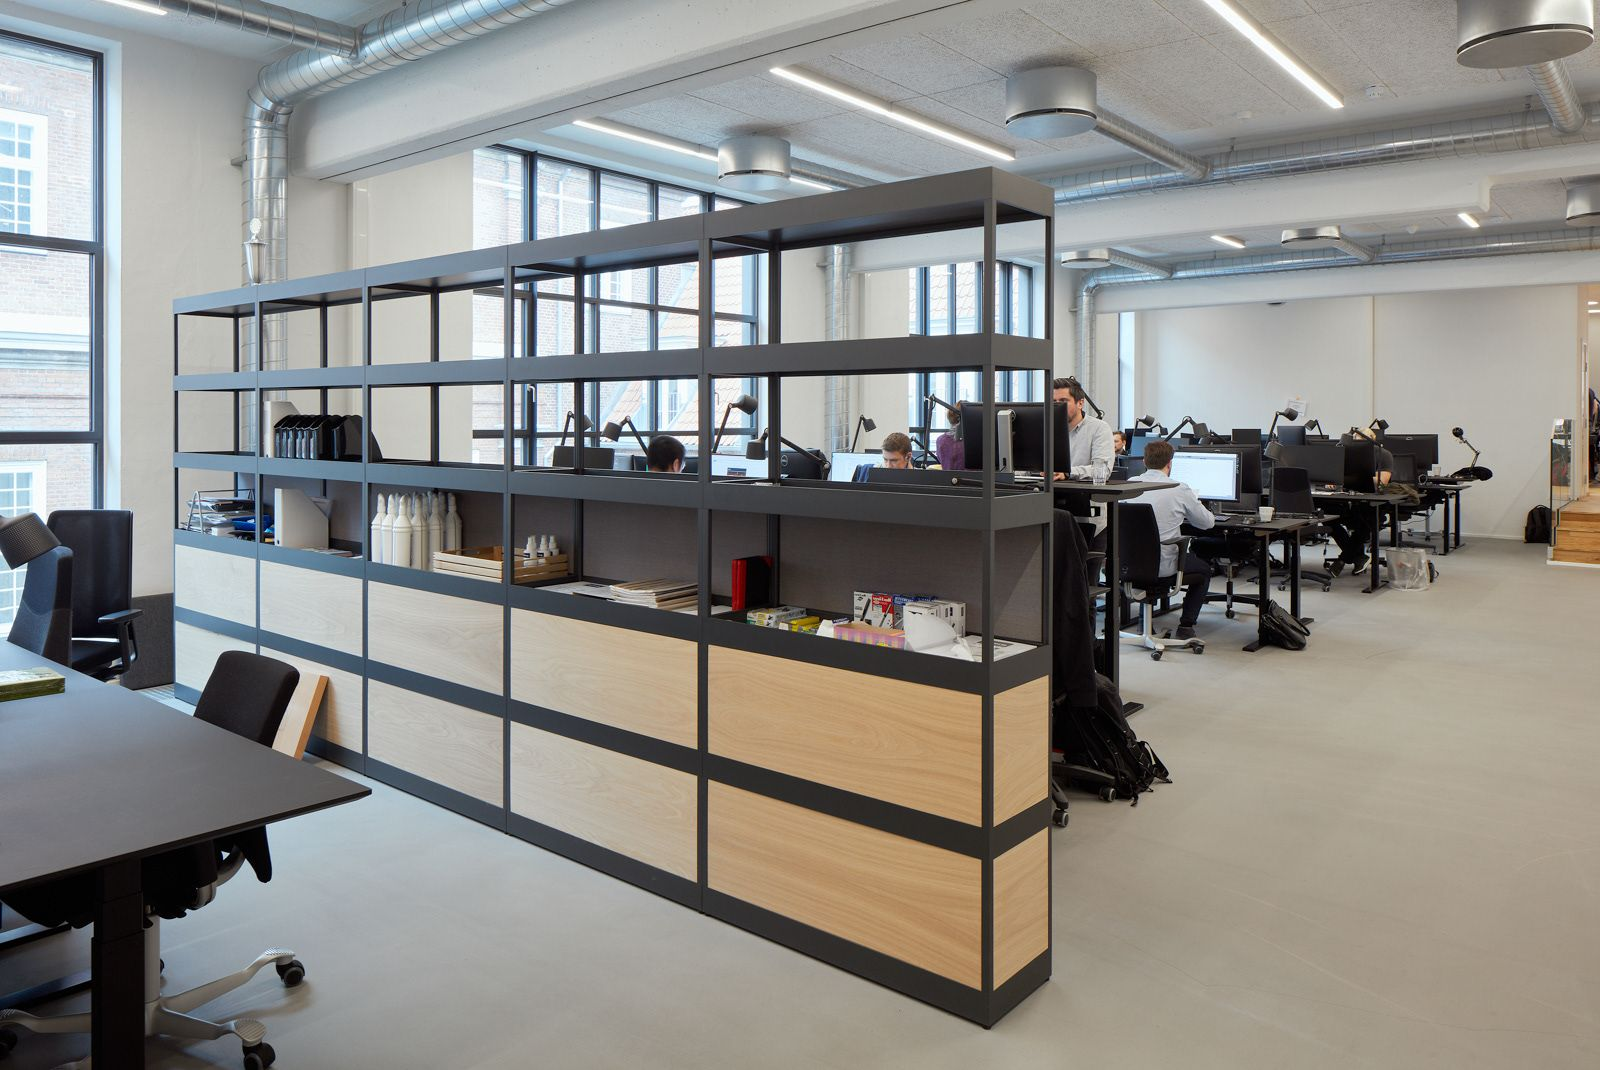 Interiors Copenhagen Headquarter for Unity by